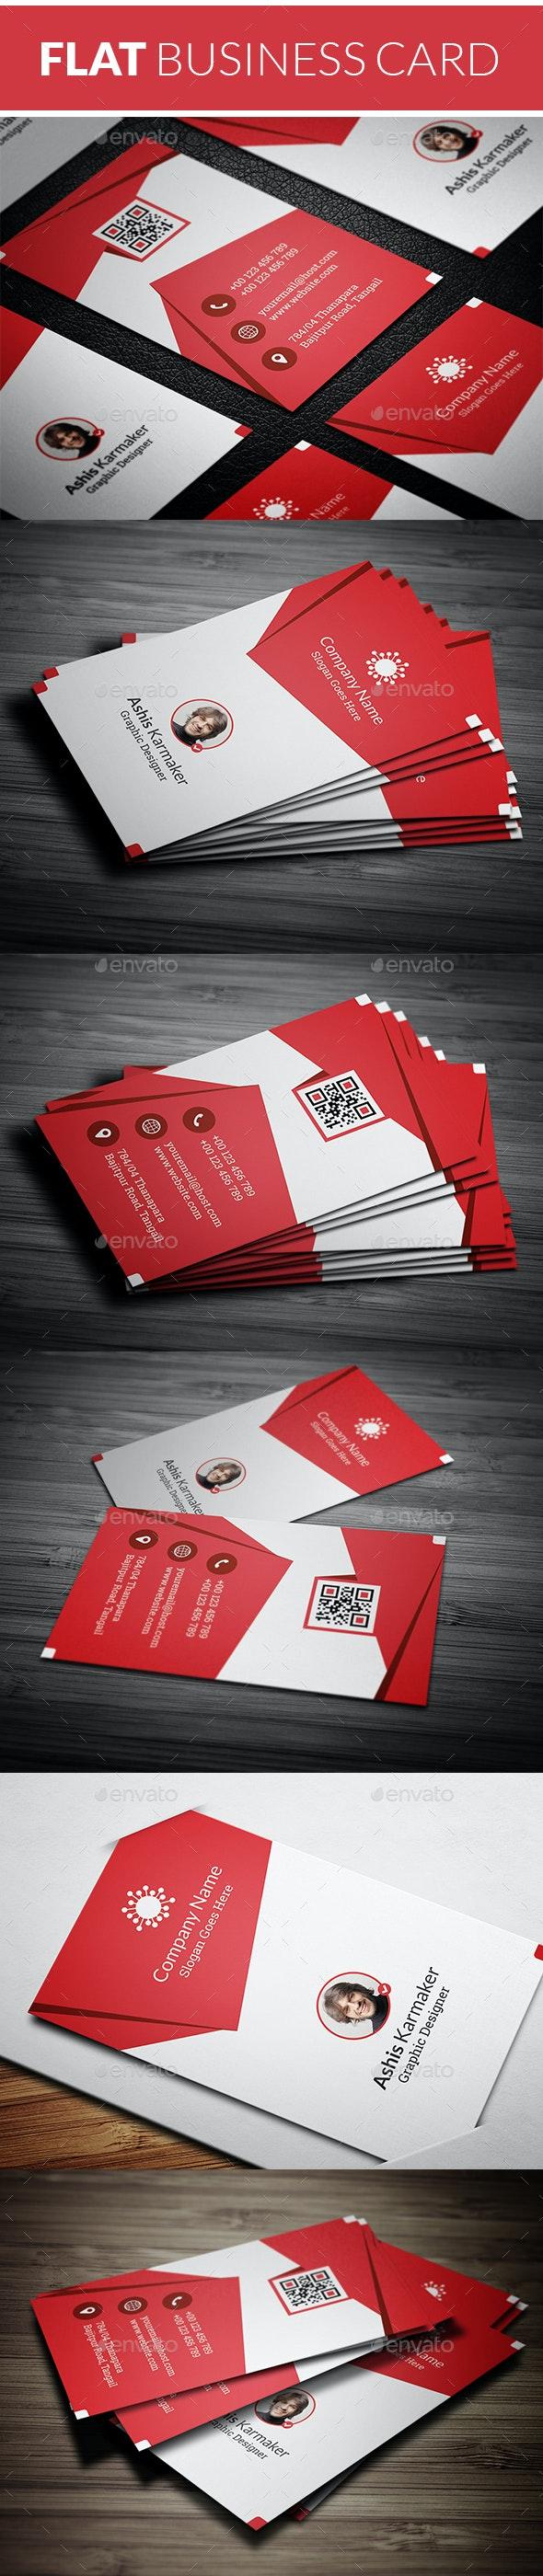 Flat Business Card - Business Cards Print Templates